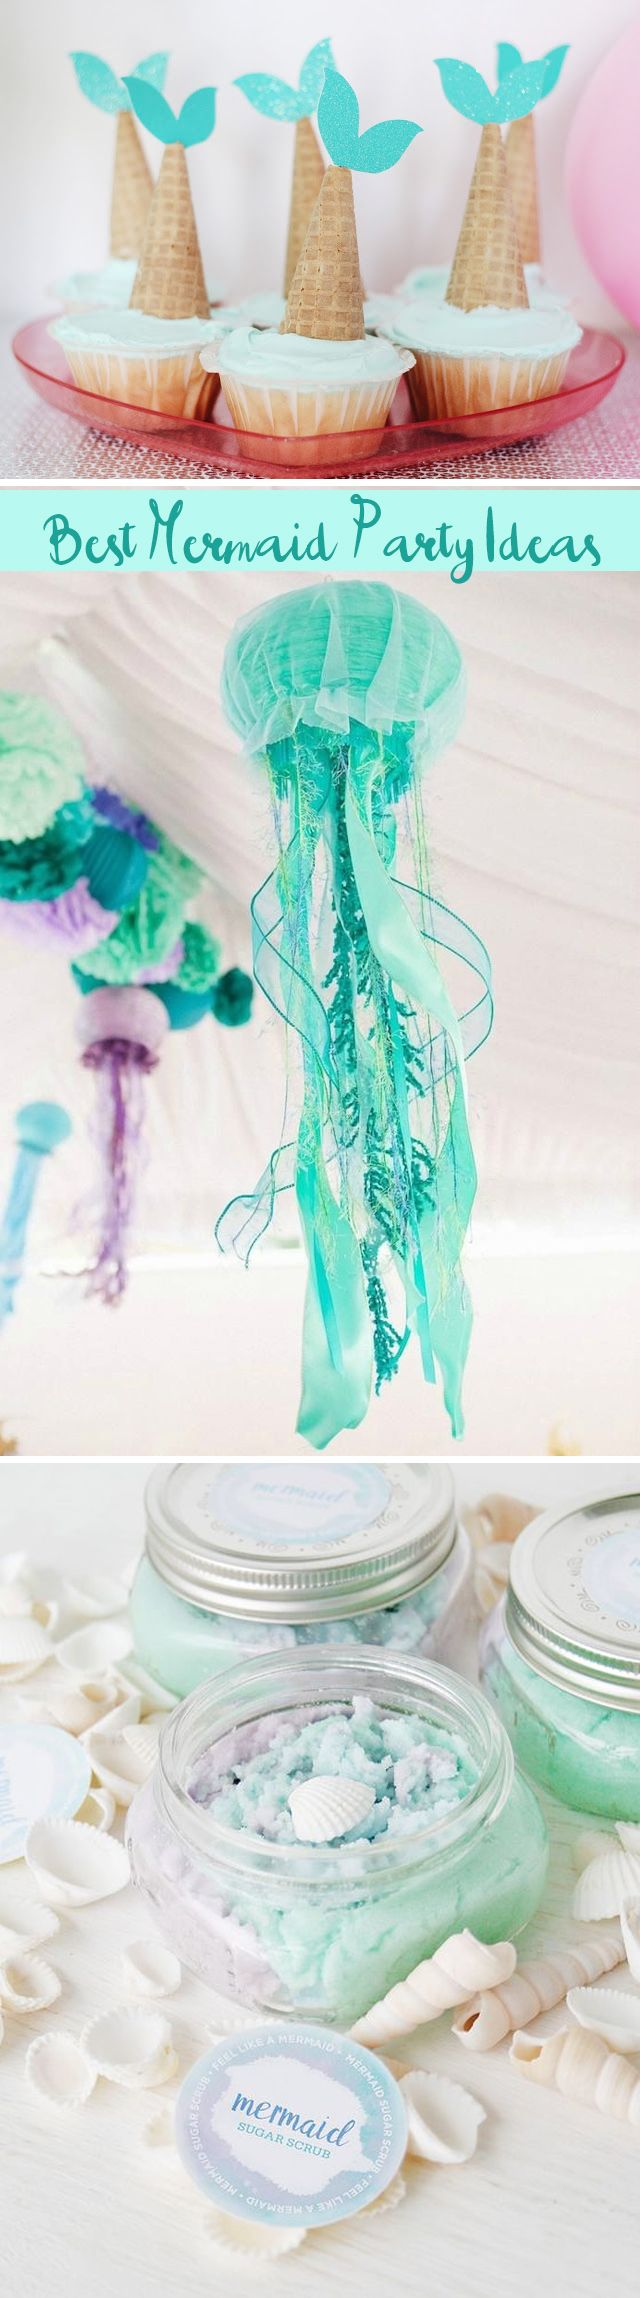 Best Mermaid Party Ideas